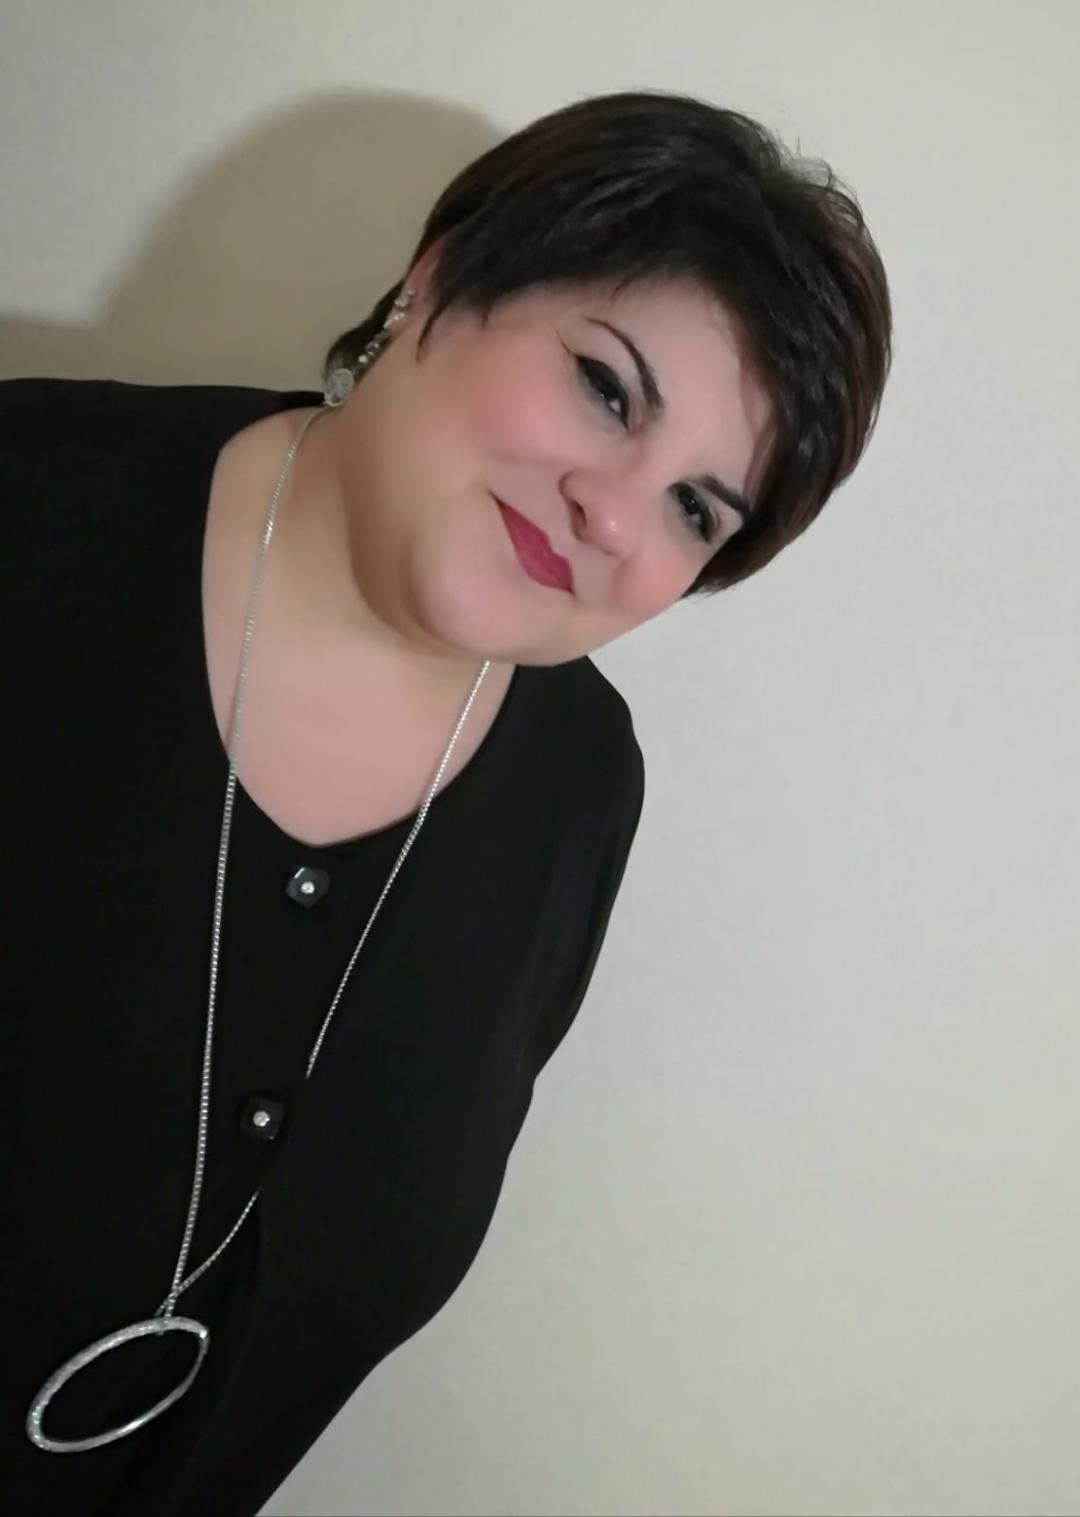 Mina Saracino